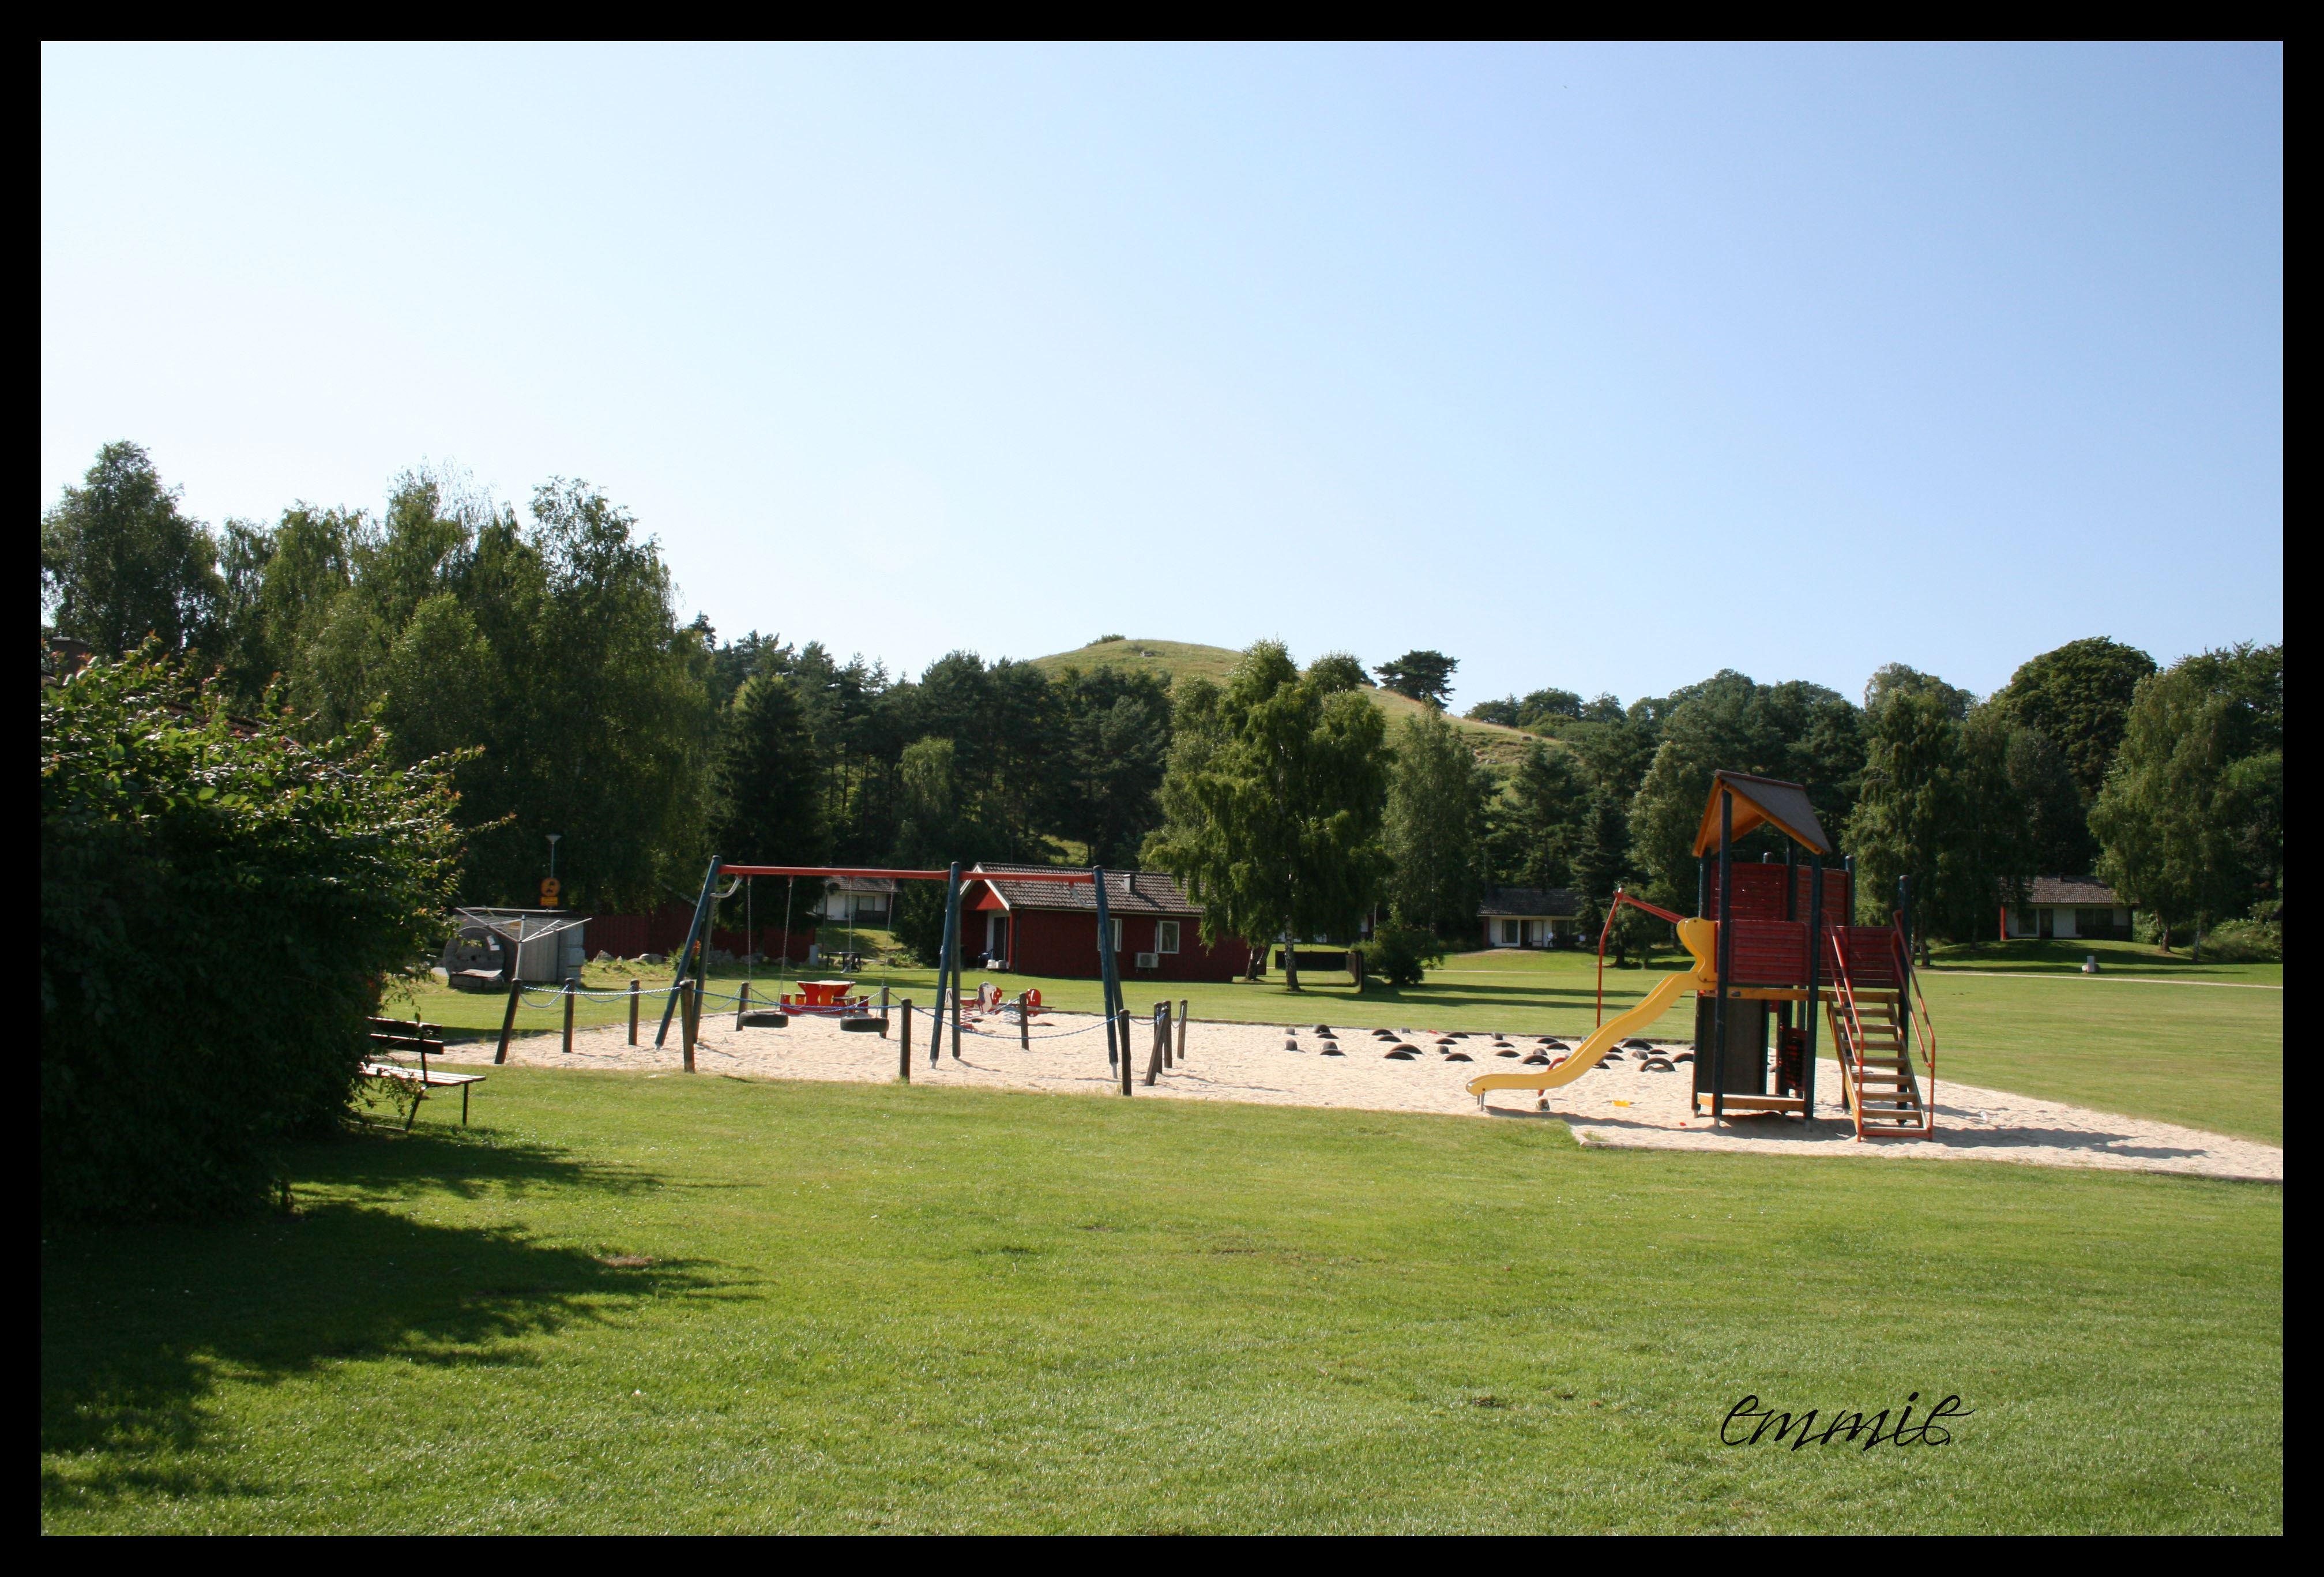 Degeberga Stugby-Vandrarhem